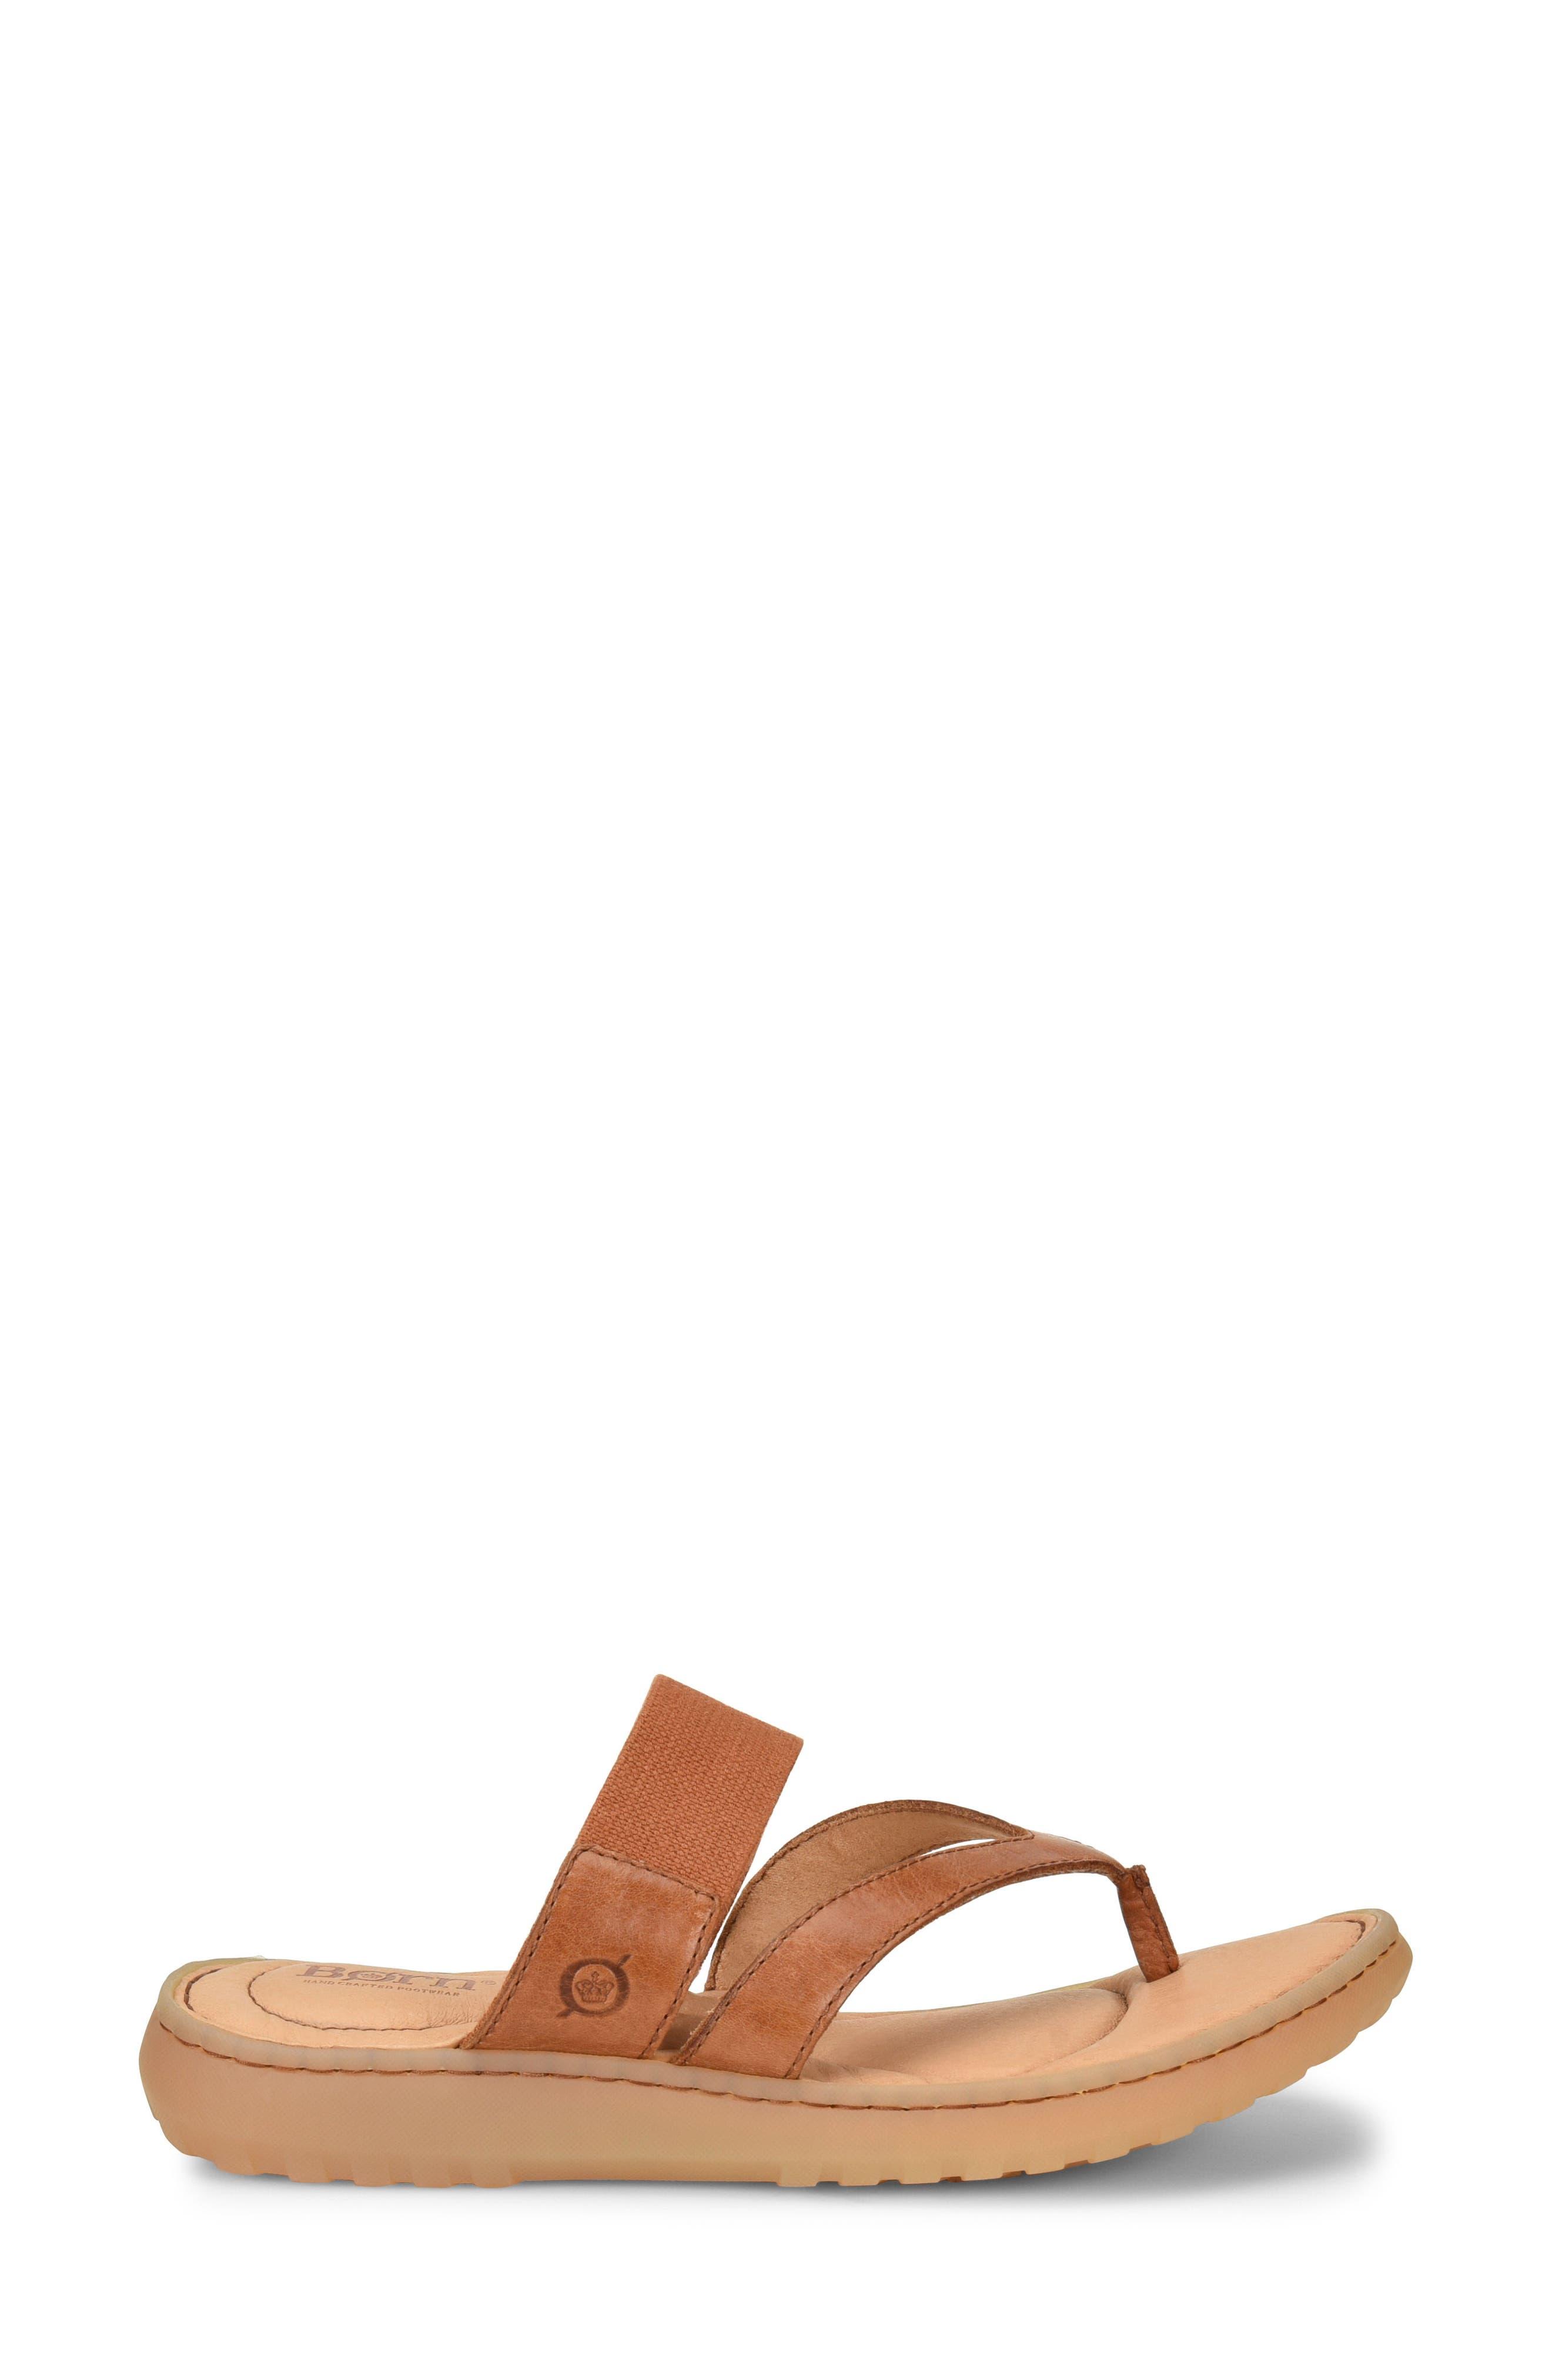 Nevis Sandal,                             Alternate thumbnail 3, color,                             Brown Leather